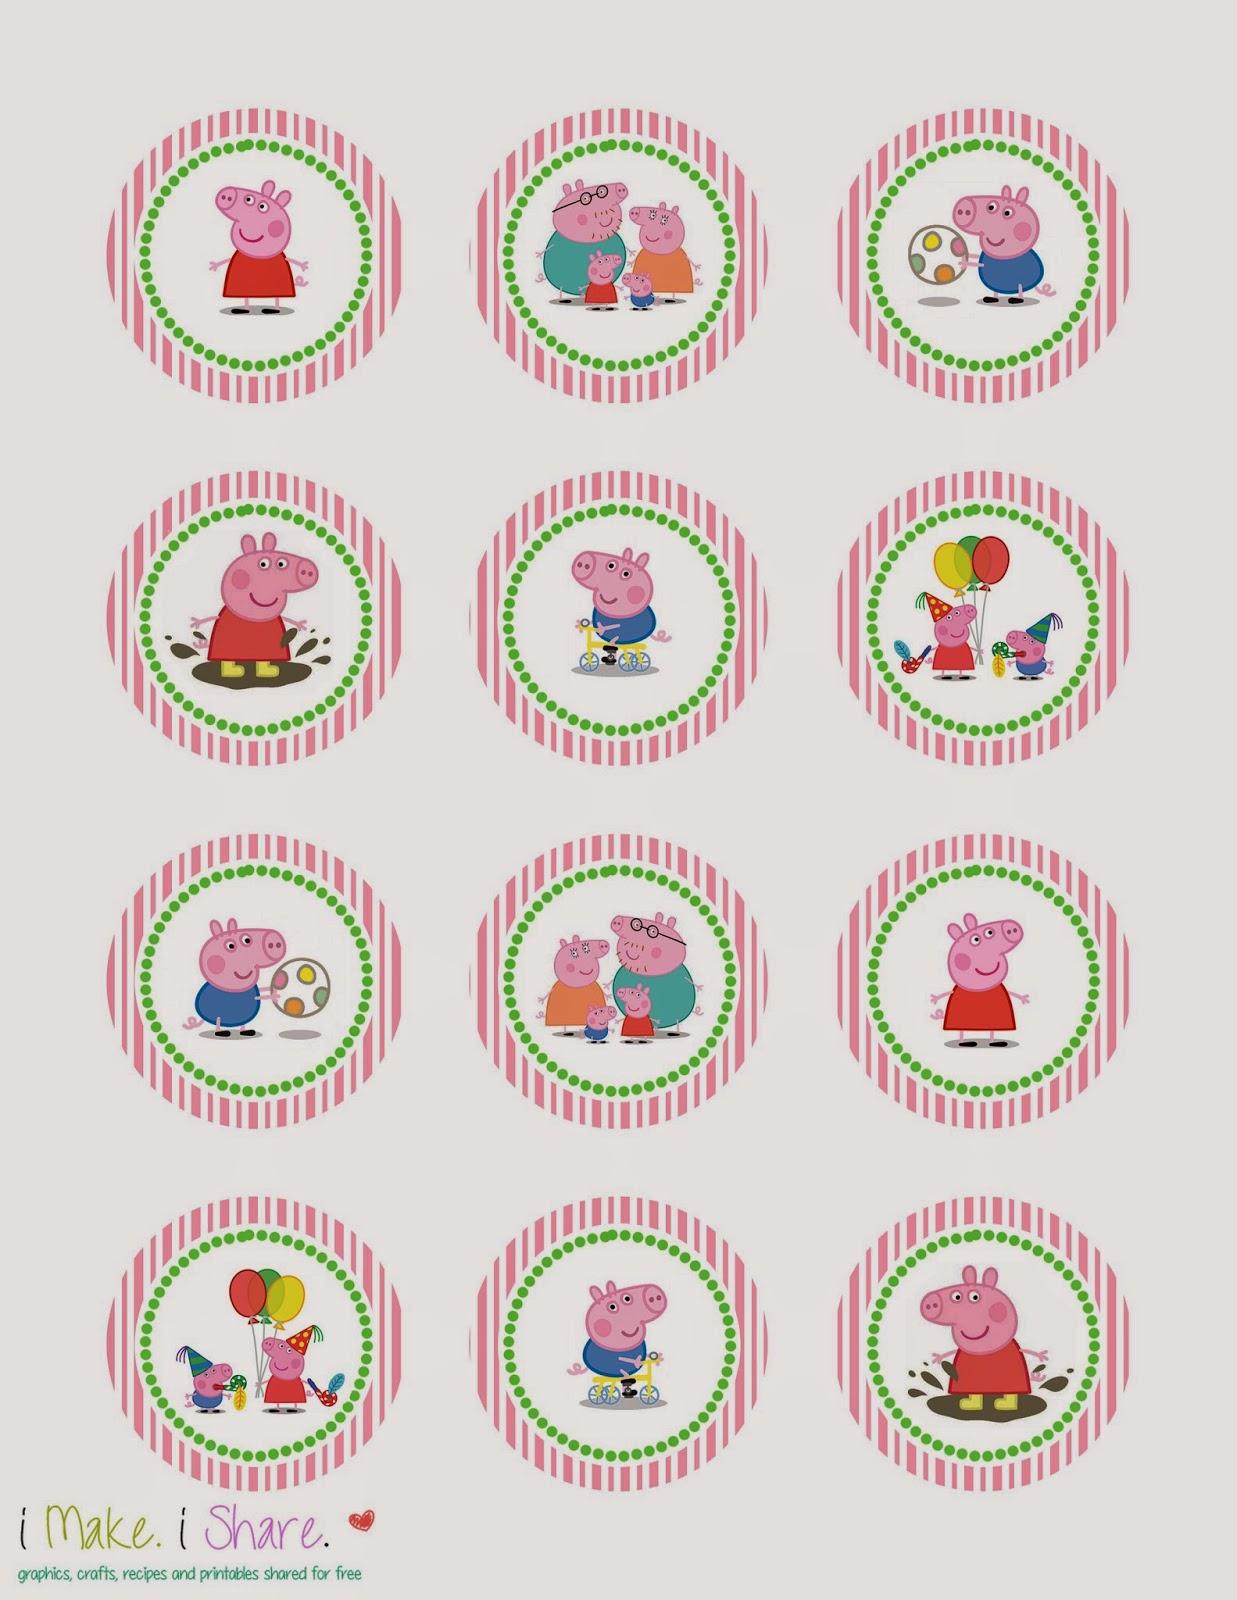 peppa pig cake template free - i make i share peppa pig cupcake template